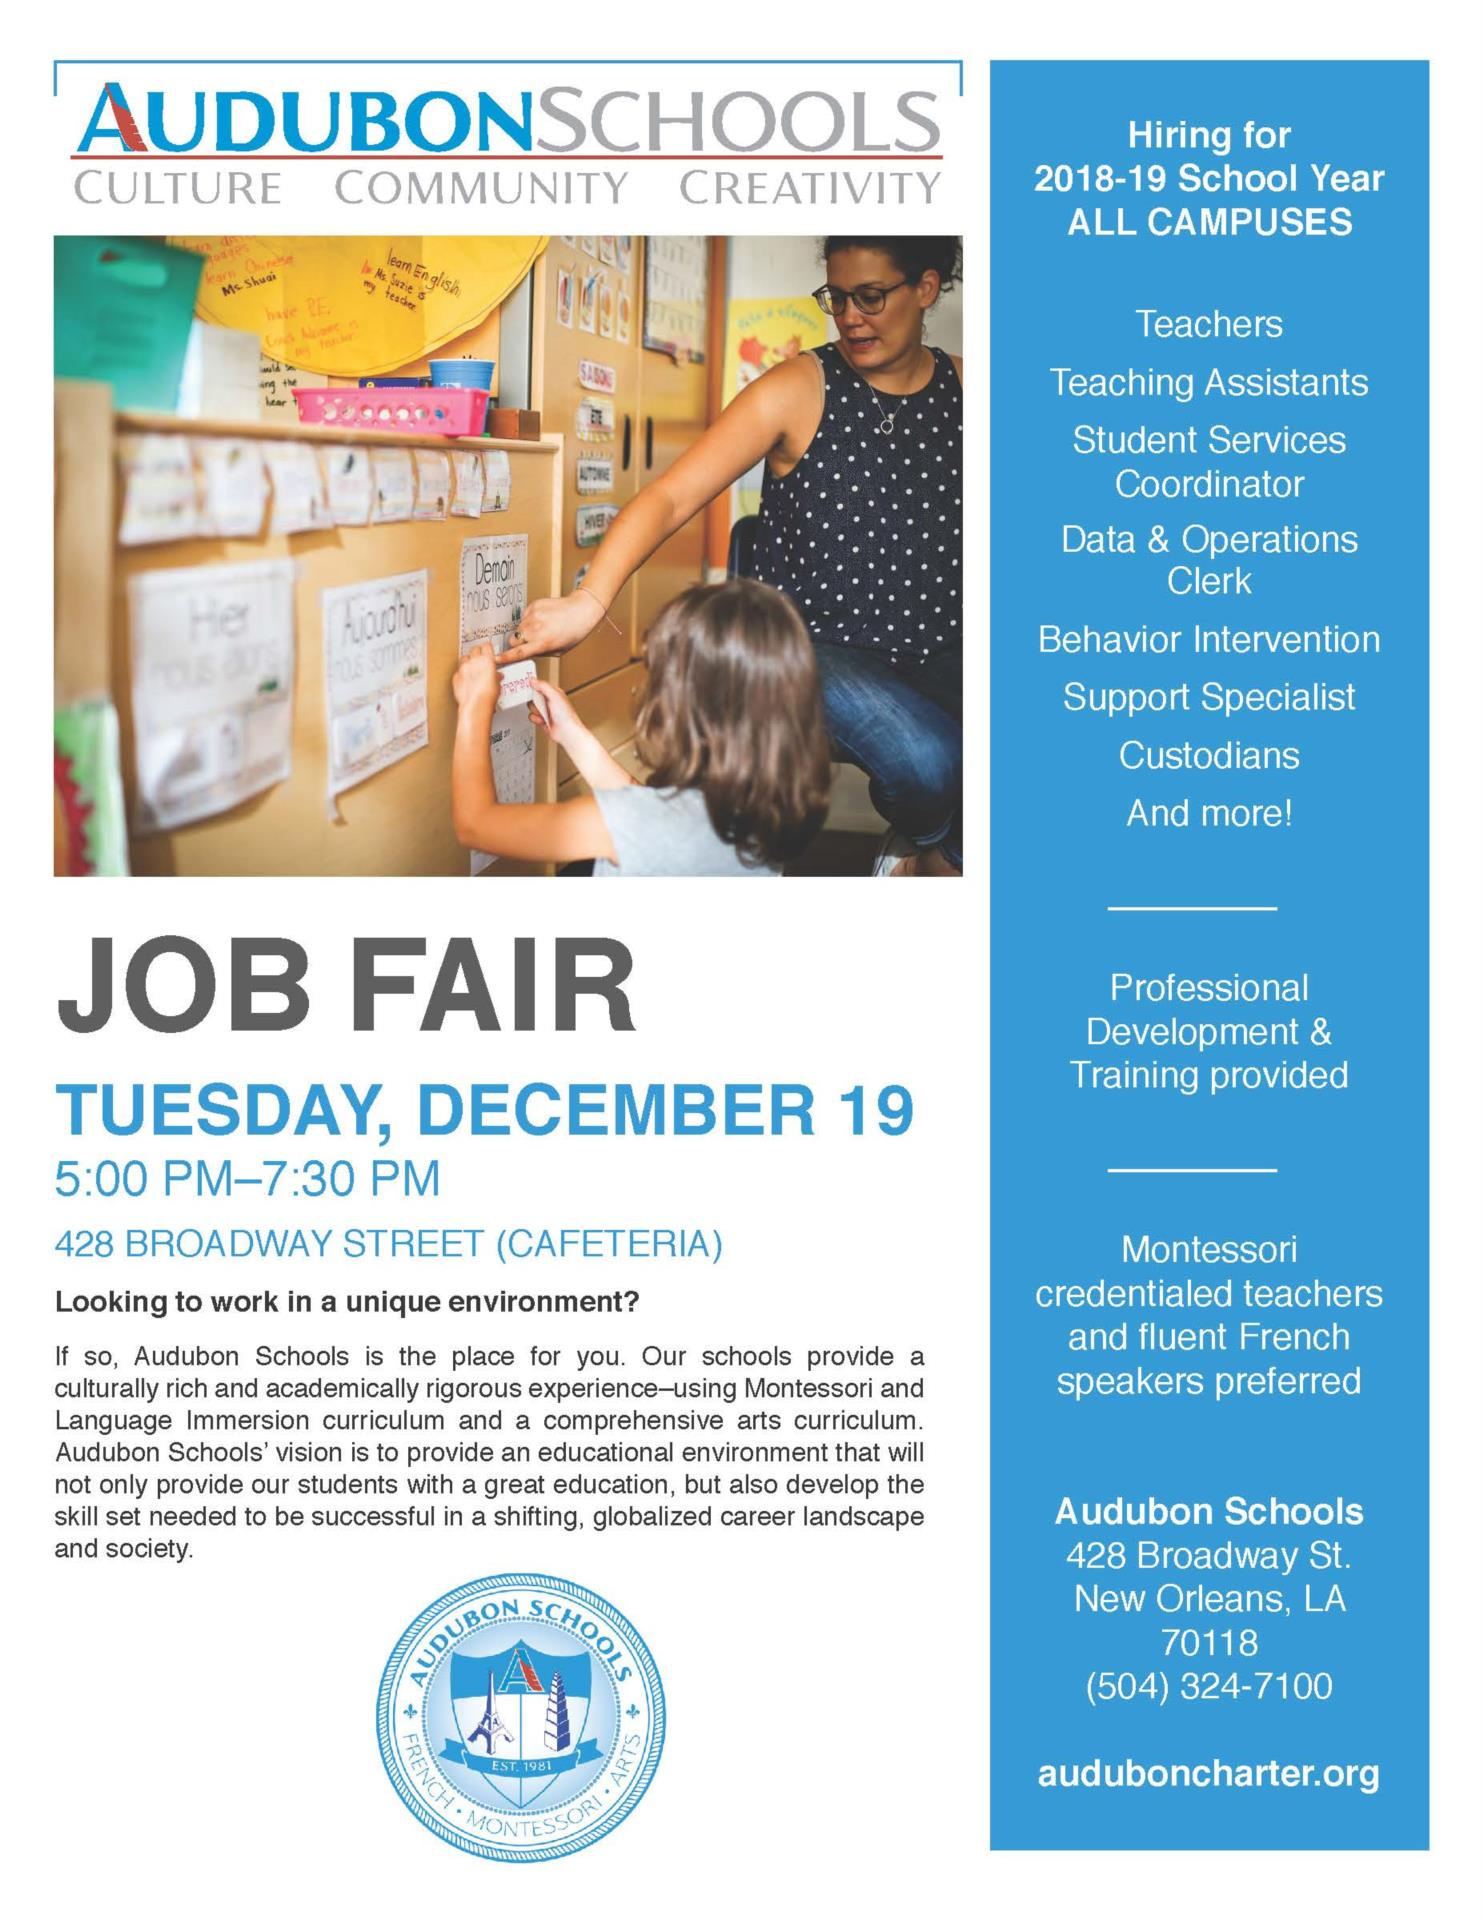 Job Fair 2017 Flyer